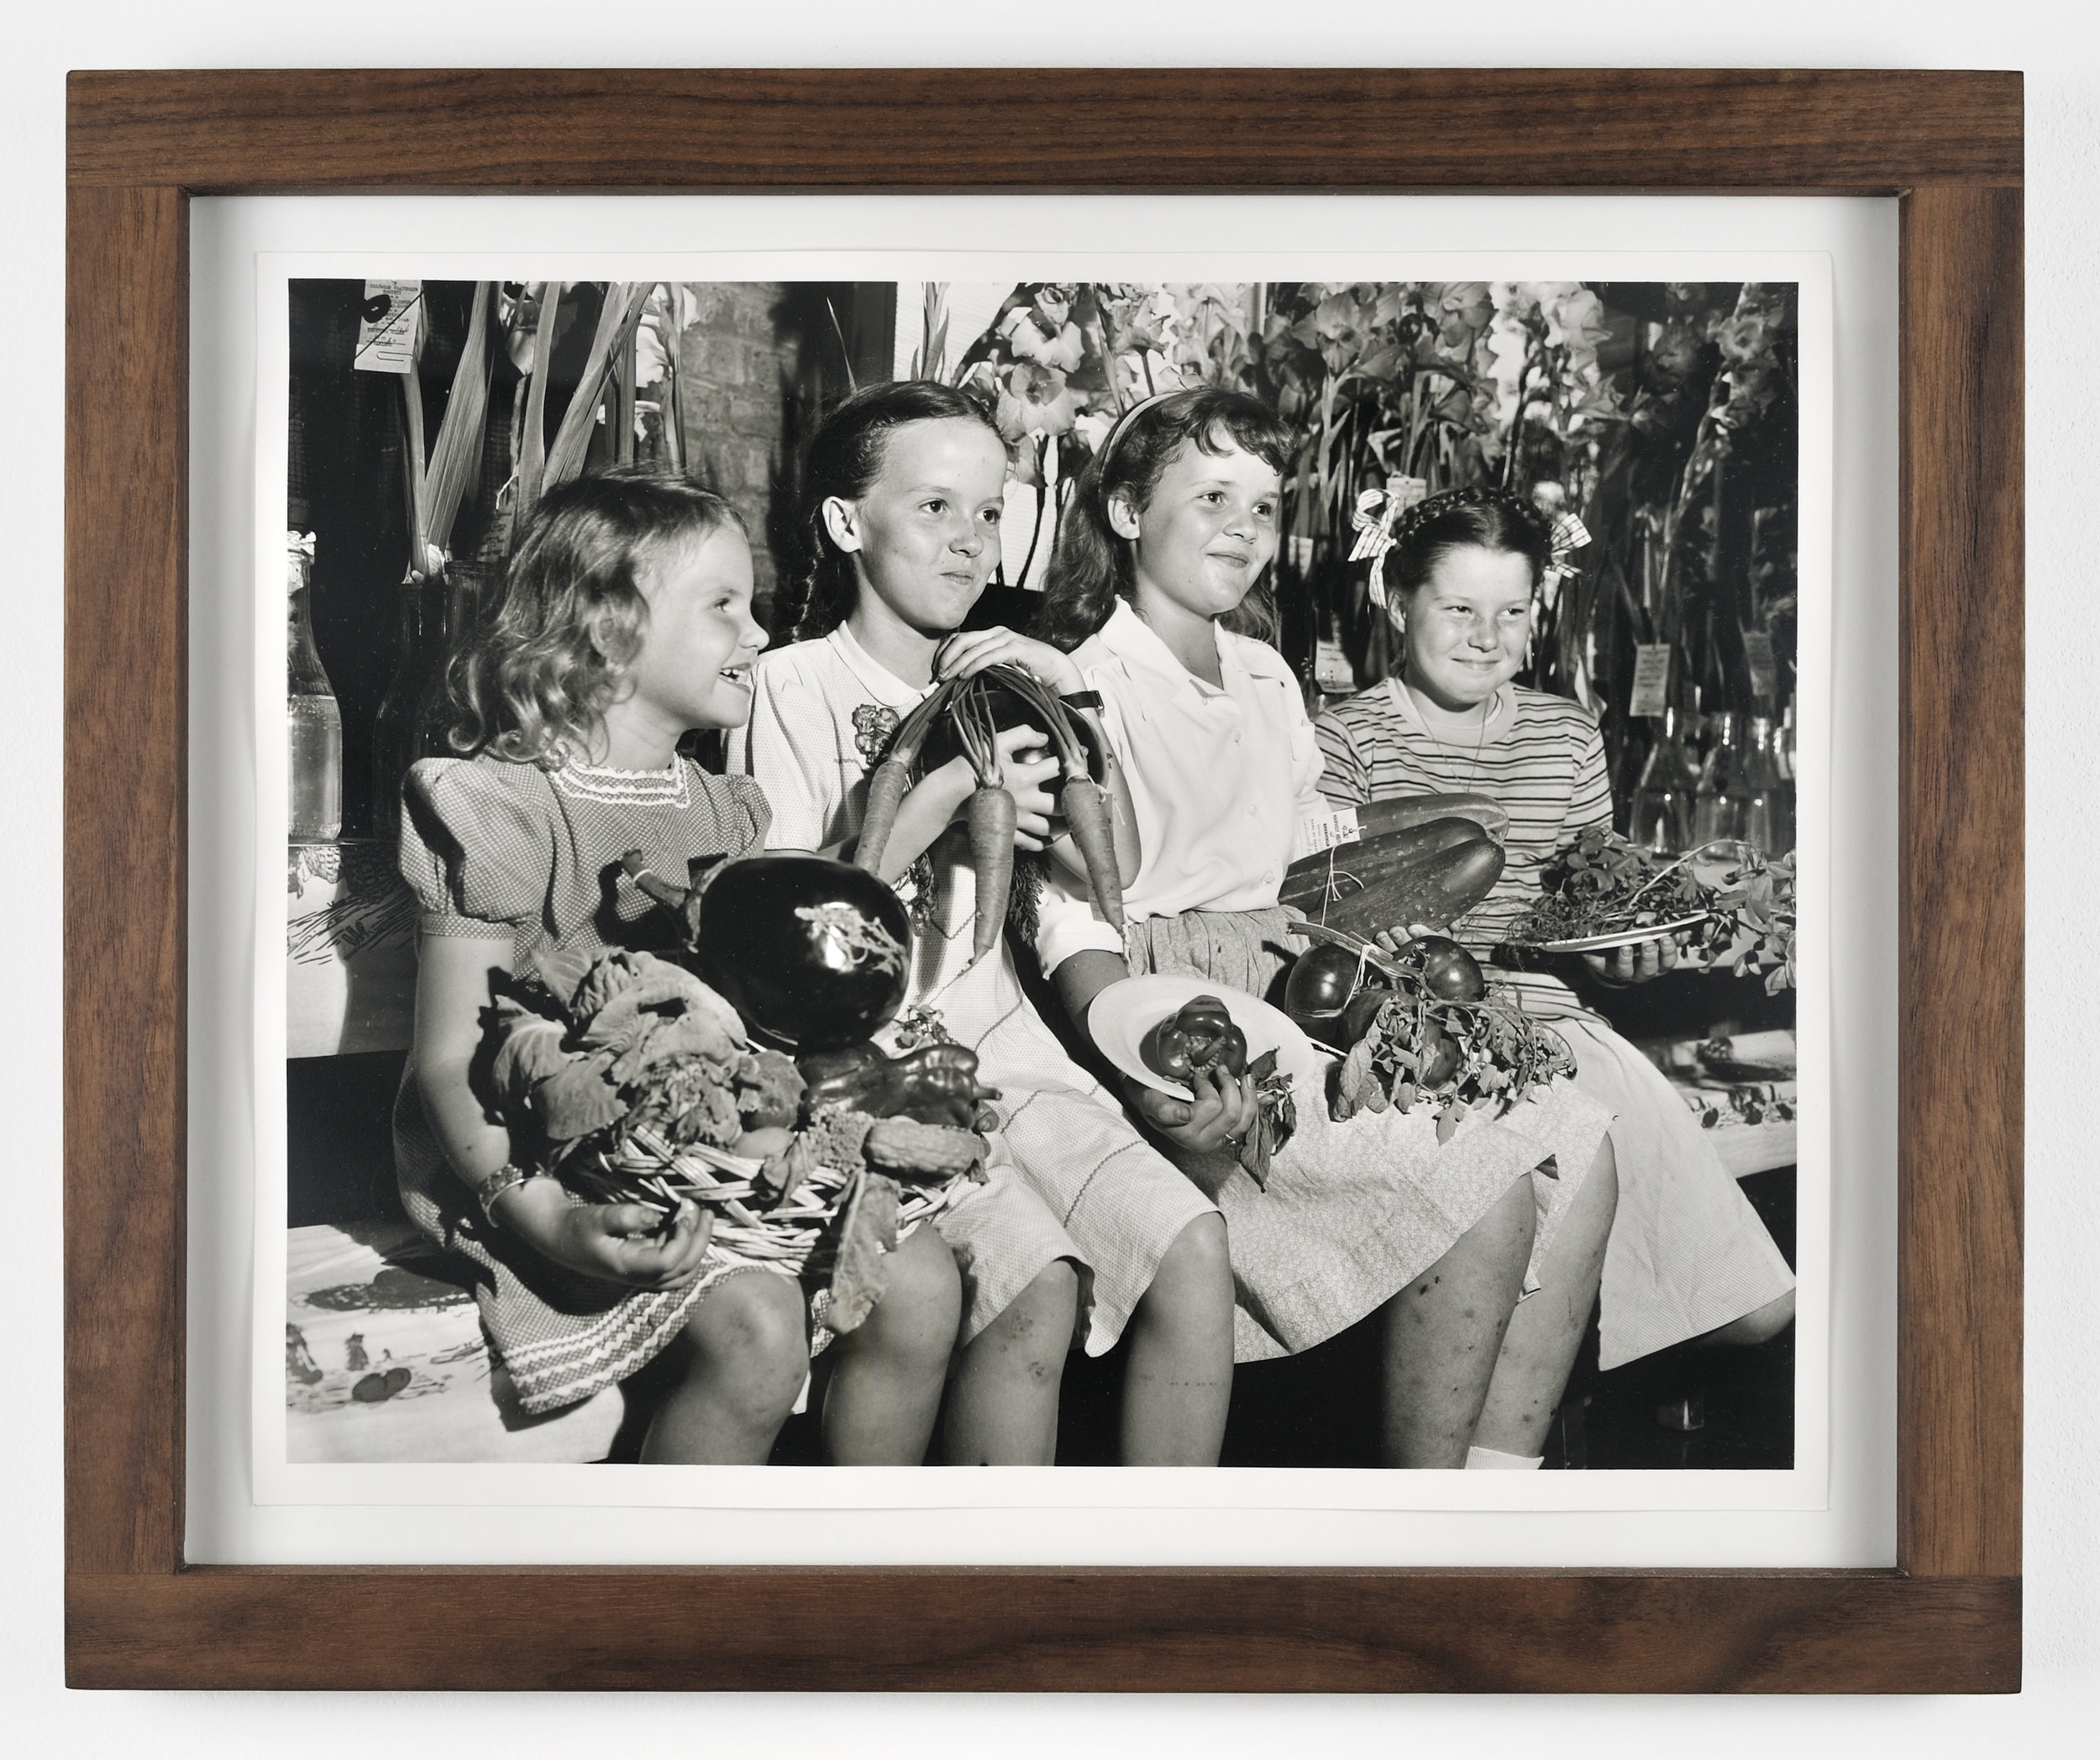 Victory Maidens, 1943-2011 black & white photo, walnut wood frame 35,6 x 43,2 cm - 14 x 17 inches